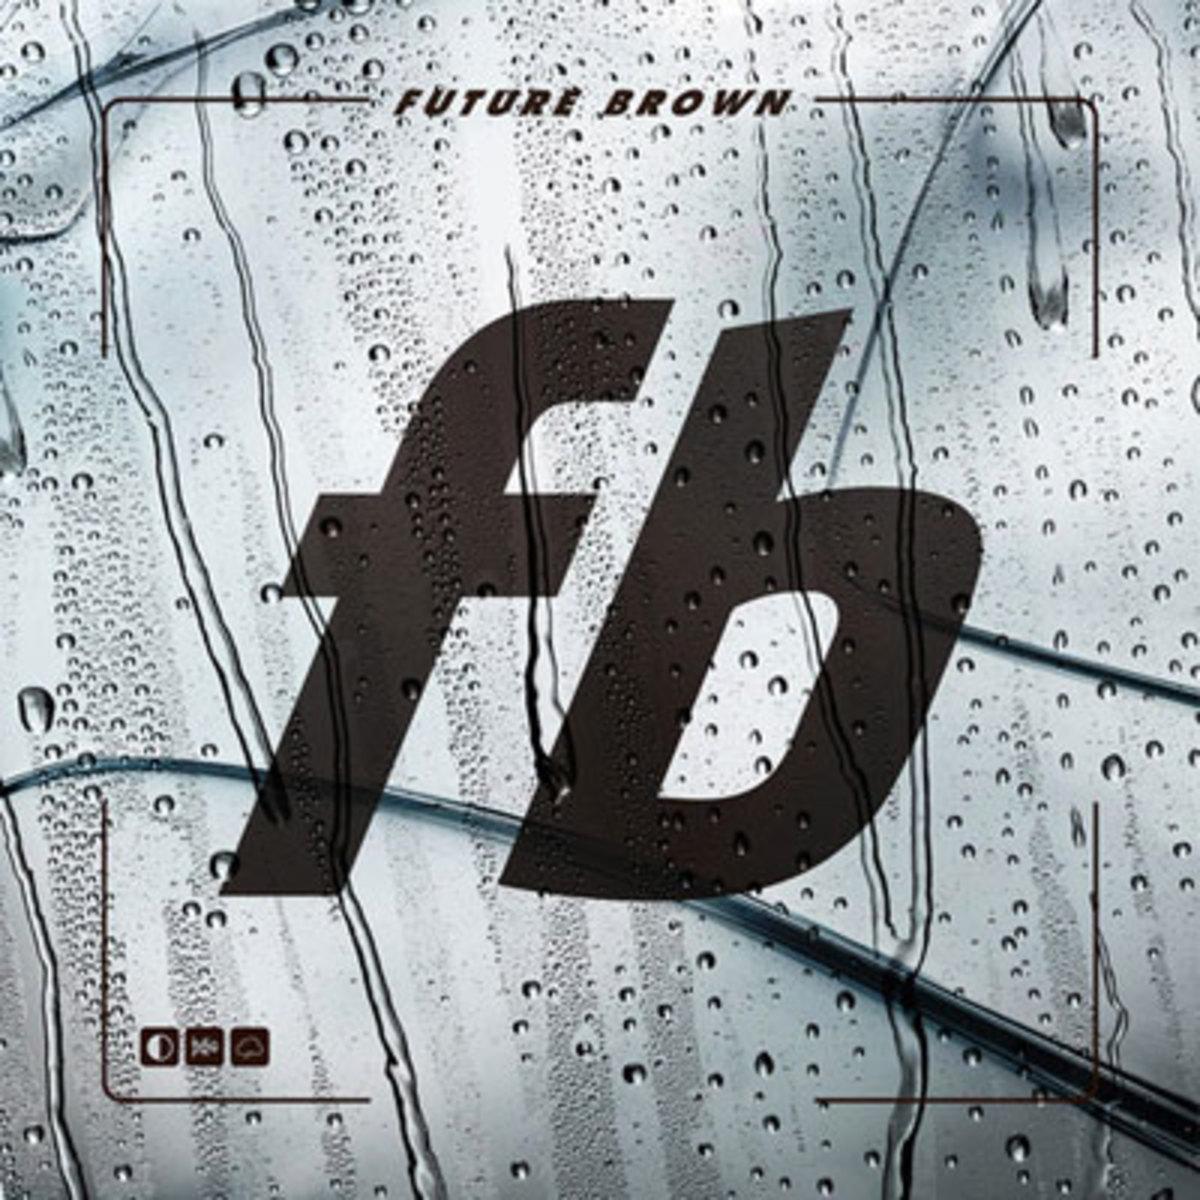 futurebrown-futurebrown.jpg